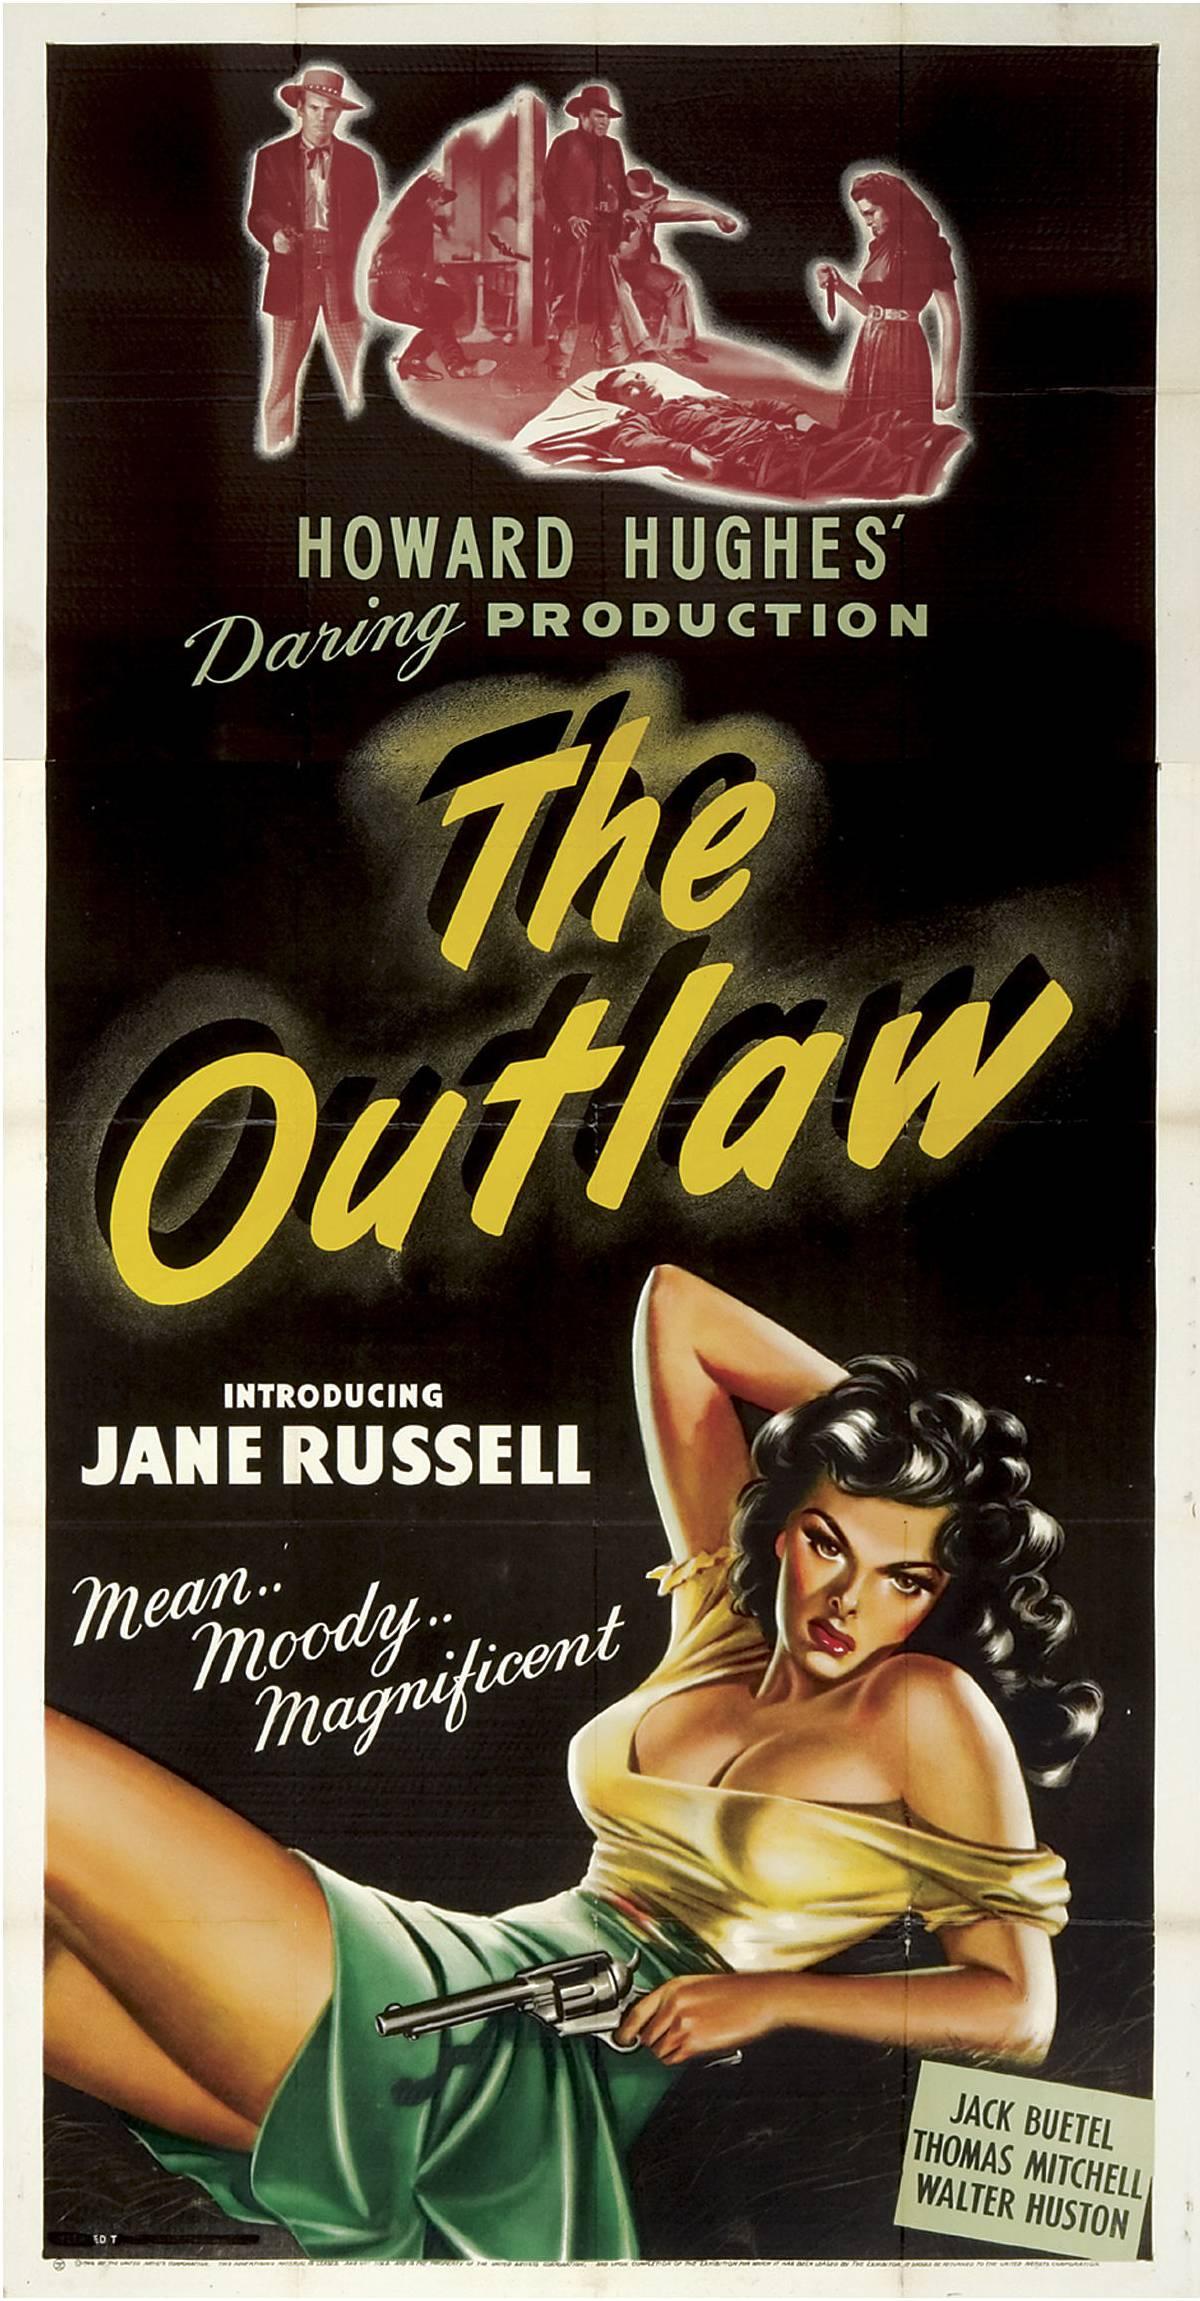 http://2.bp.blogspot.com/-D-xdMoub2YI/TkoFAo_DxpI/AAAAAAAAEuQ/oiyrXB2mGRo/s0/The+Outlaw+-+3sht.jpg